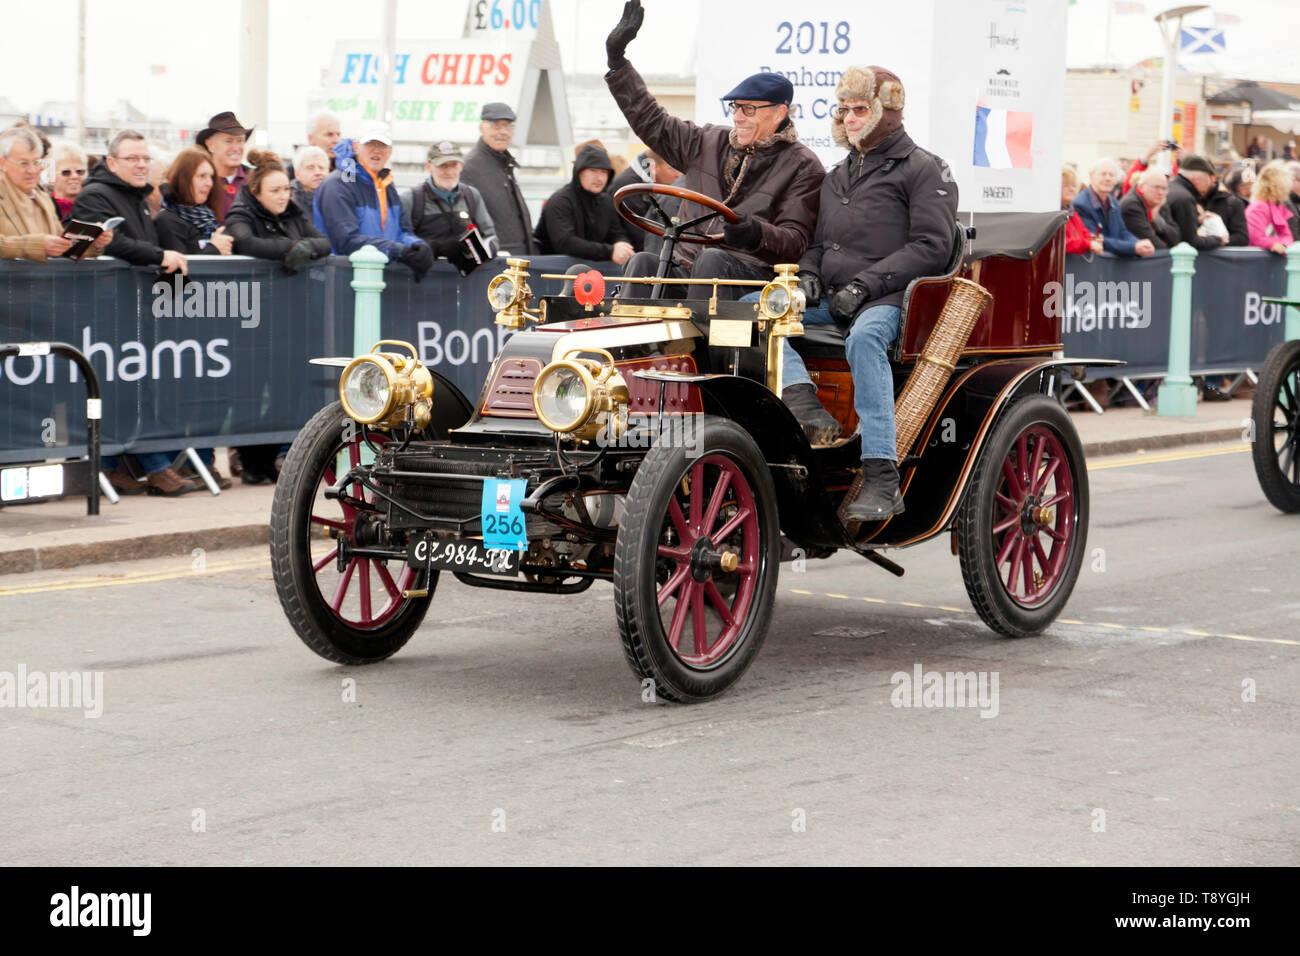 Mr Klazinus Noordijk, driving his 1903 Richard-Brasier across the finishing line at the end of the 2018 London to Brighton Veteran Car Run Stock Photo